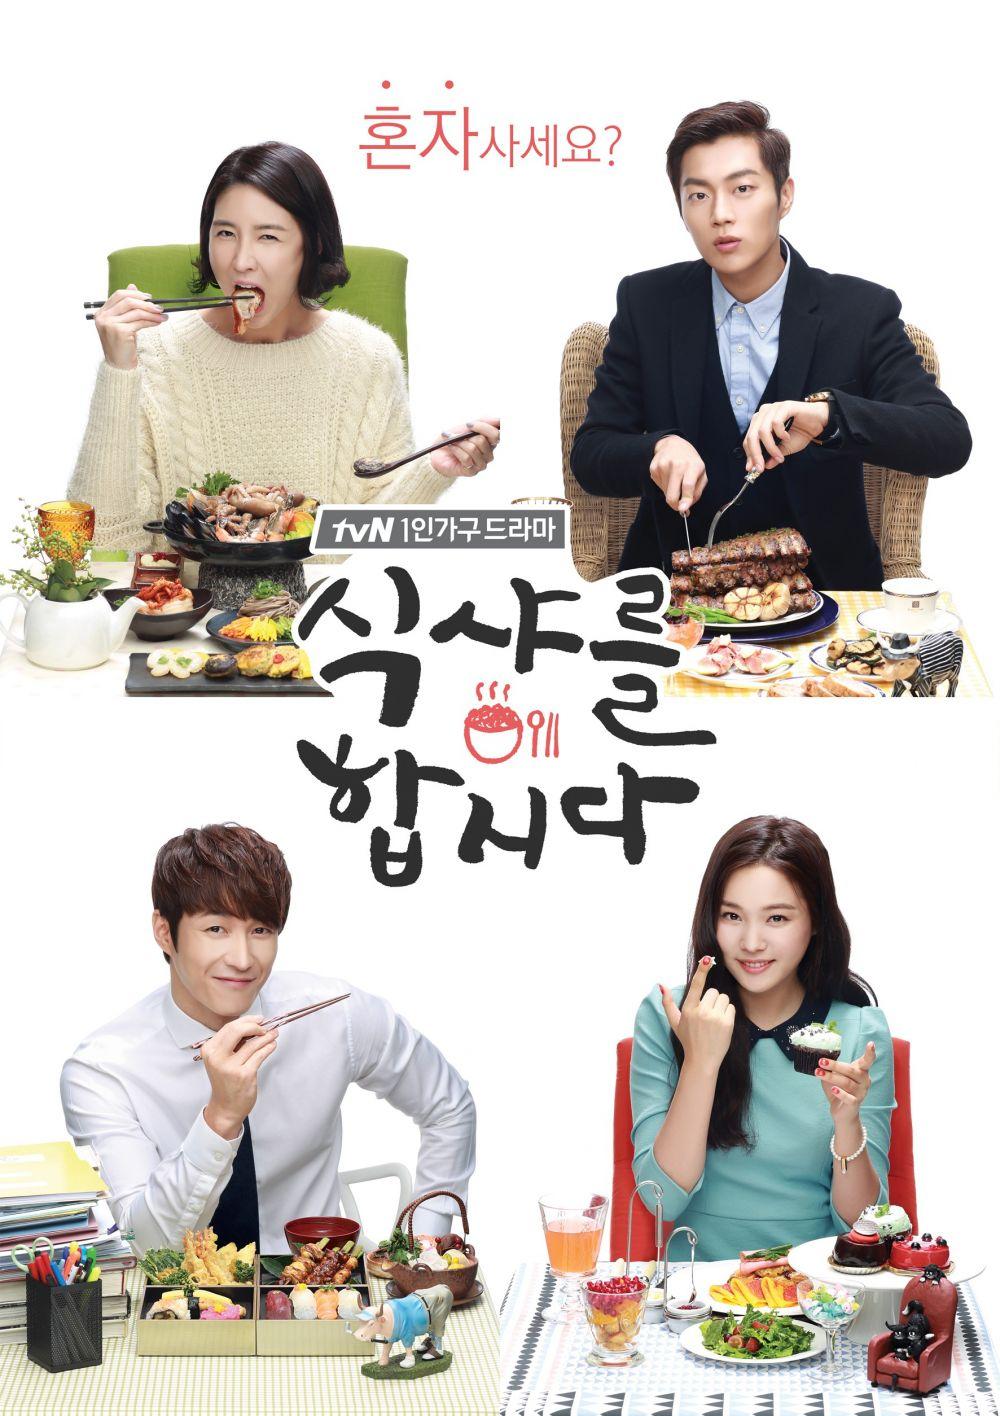 Drama Korea bertema makanan © 2019 brilio.net